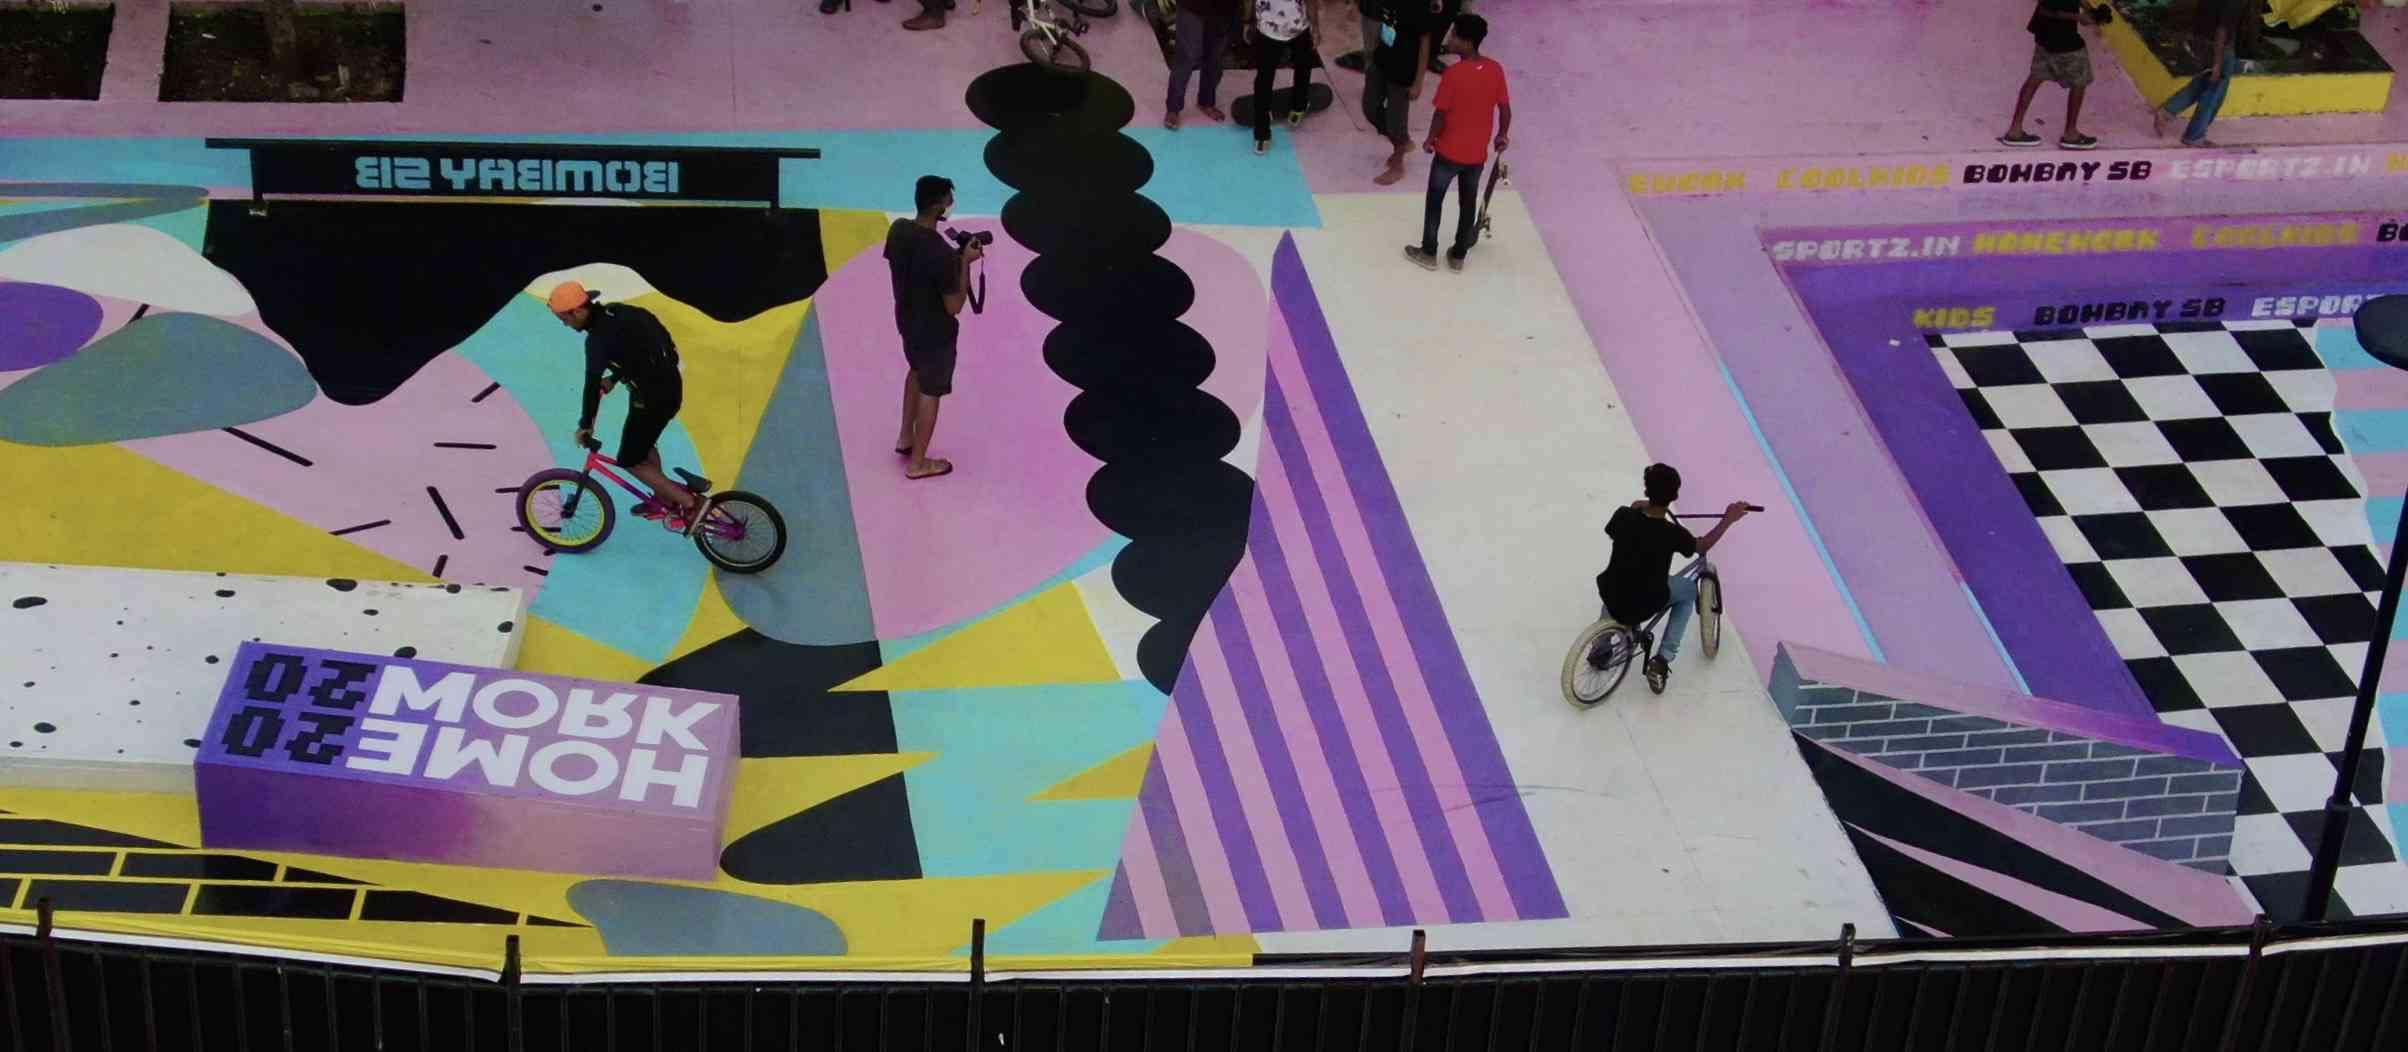 carter road skatepark with mural illustrations